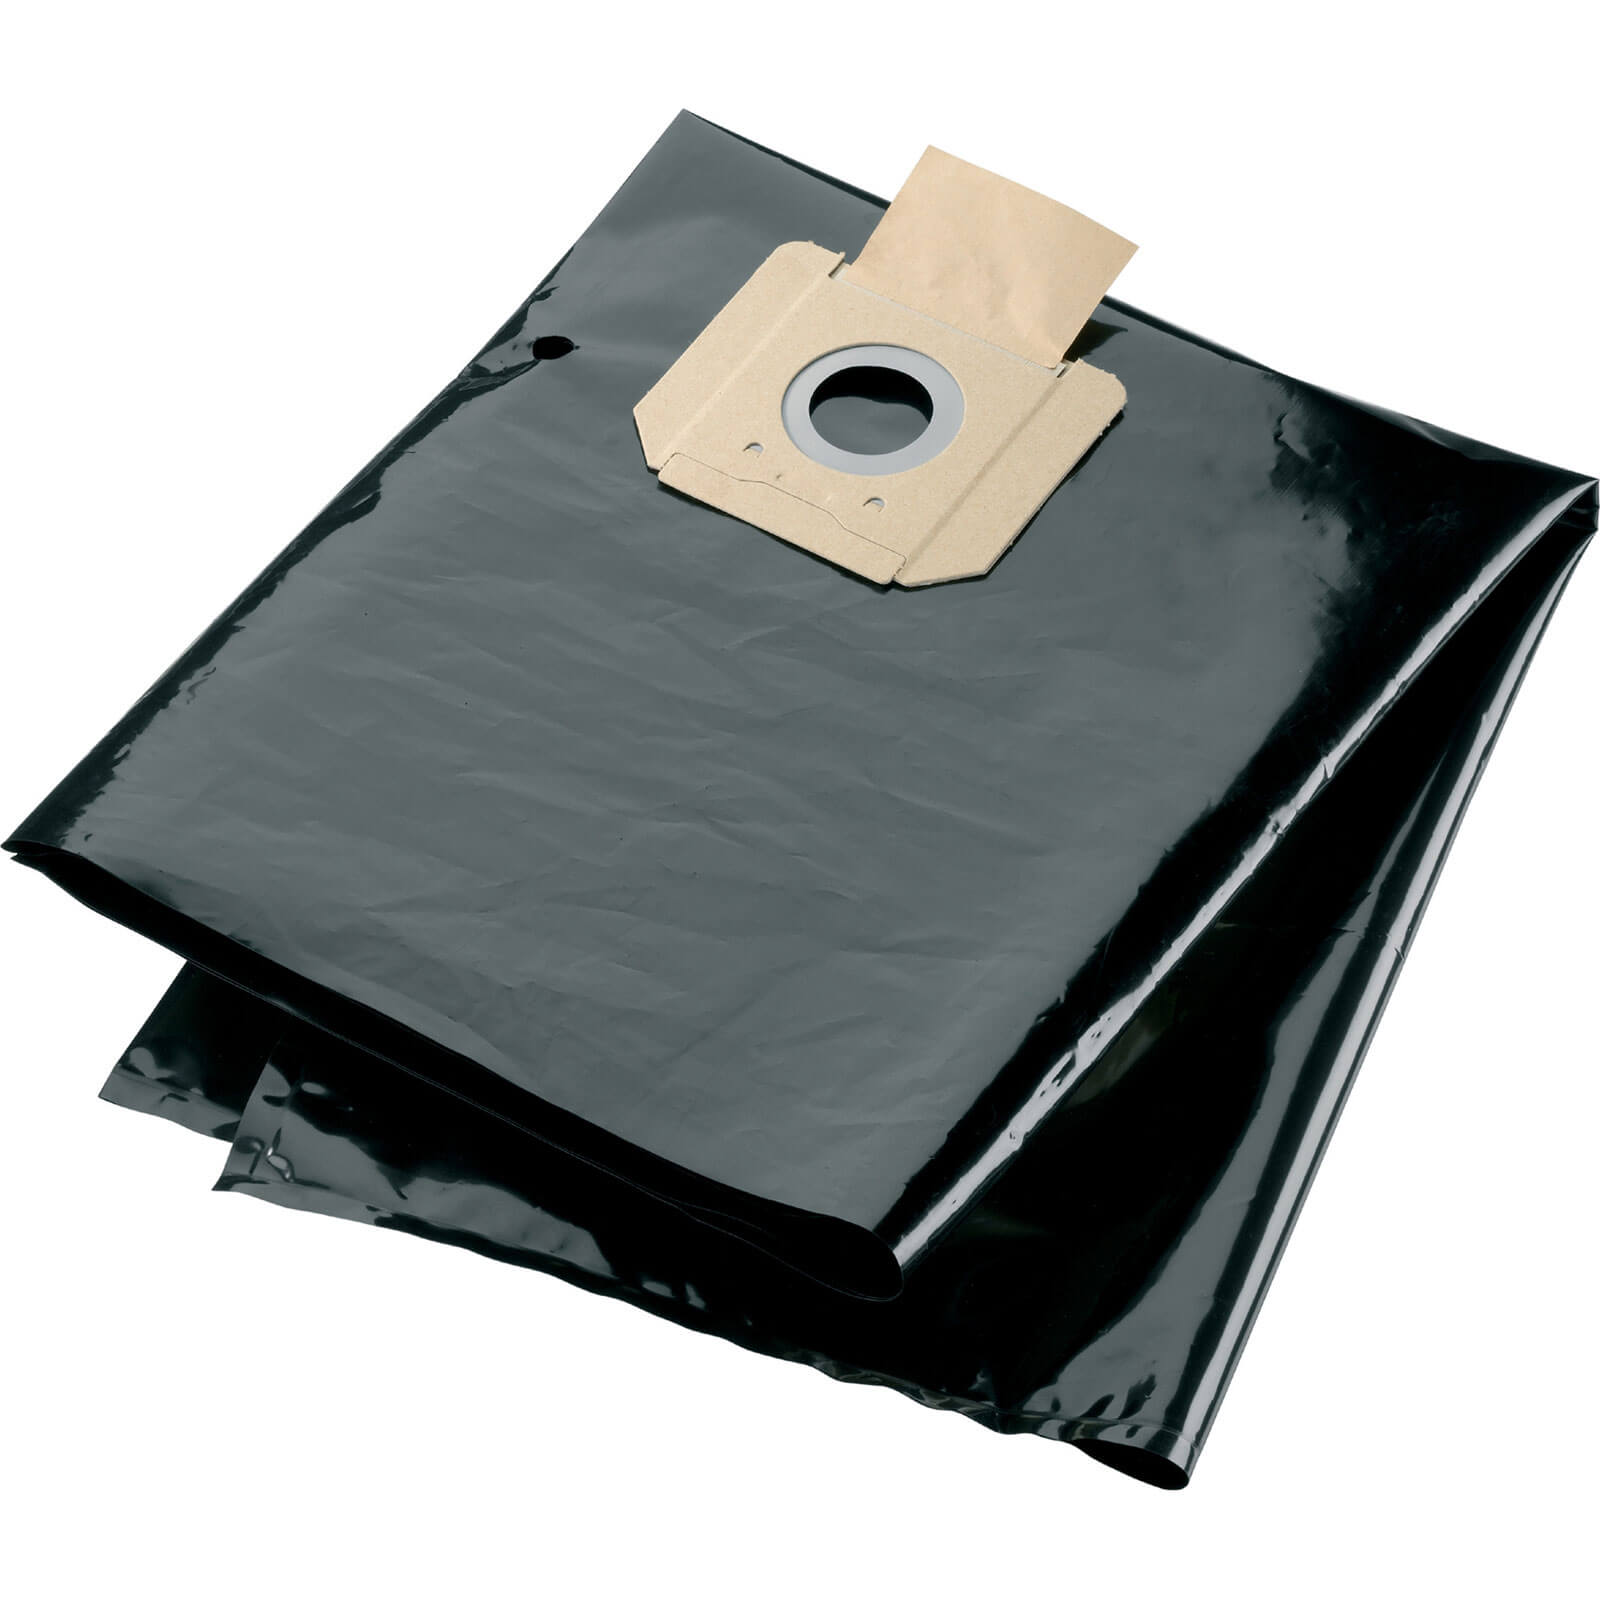 Image of Flex Wet & Dry Vacuum Dust Bags Pack of 10